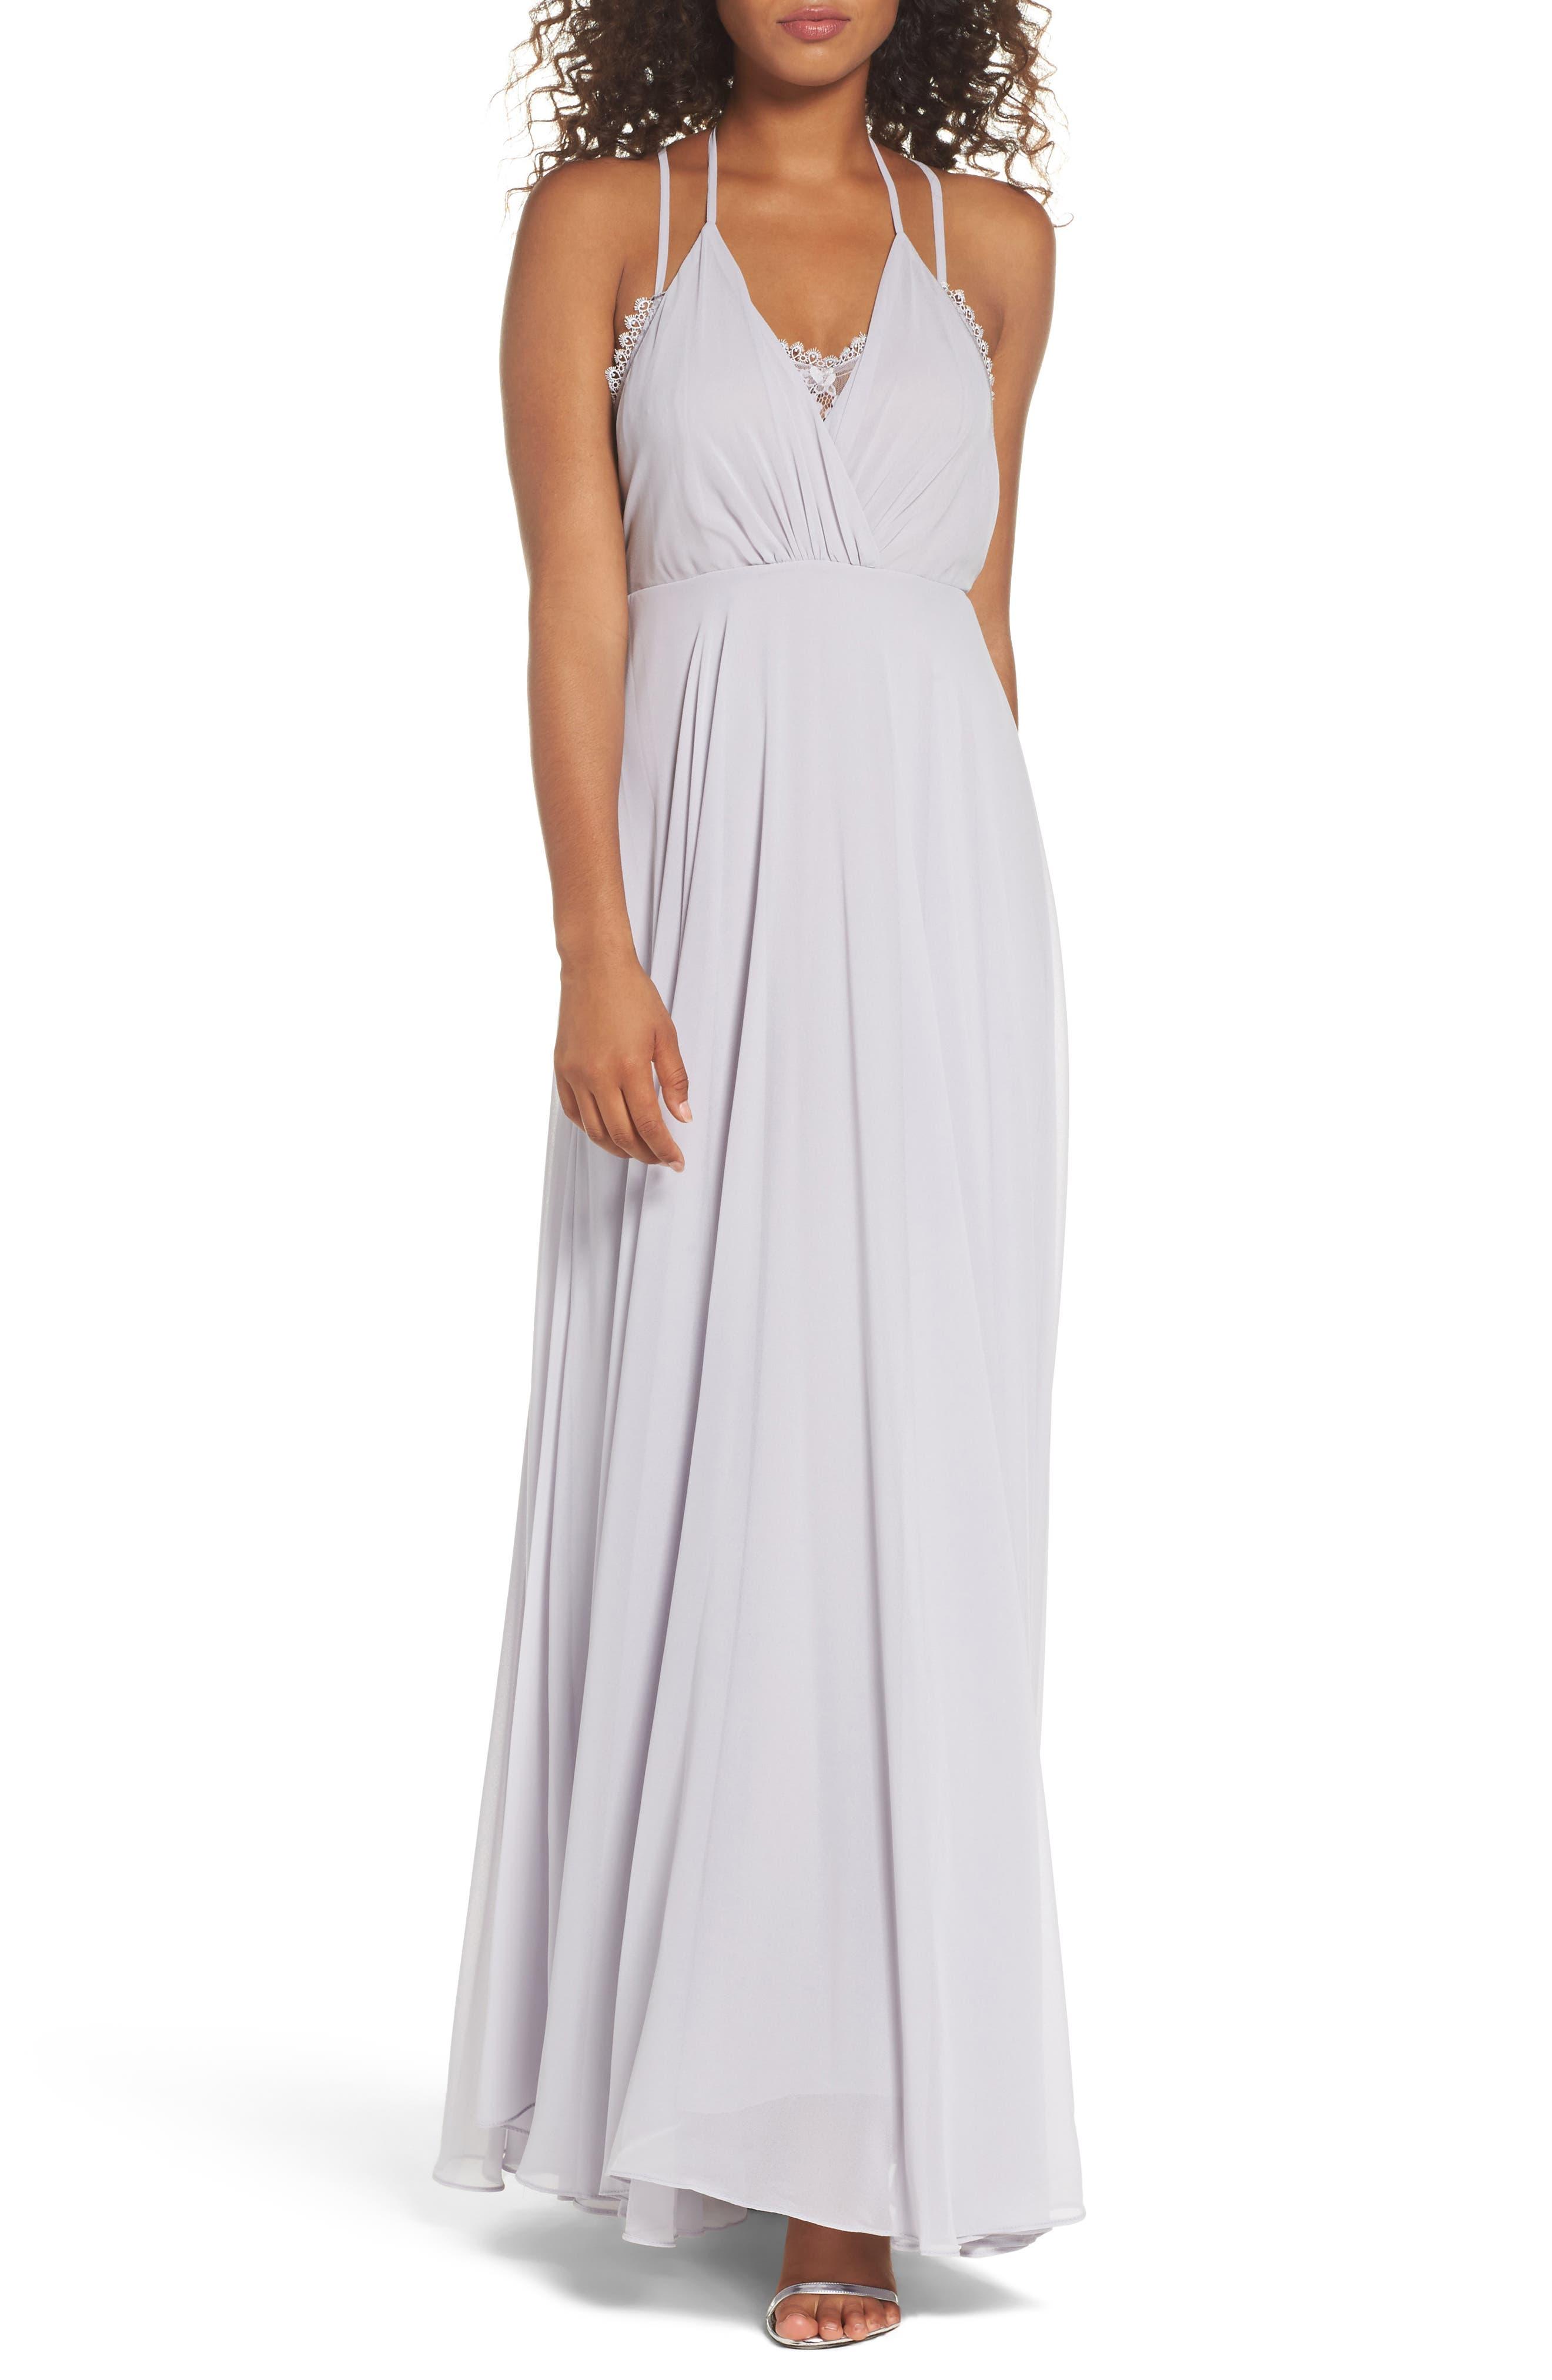 Alternate Image 1 Selected - Lulus Celebrate the Moment Lace Trim Chiffon Maxi Dress